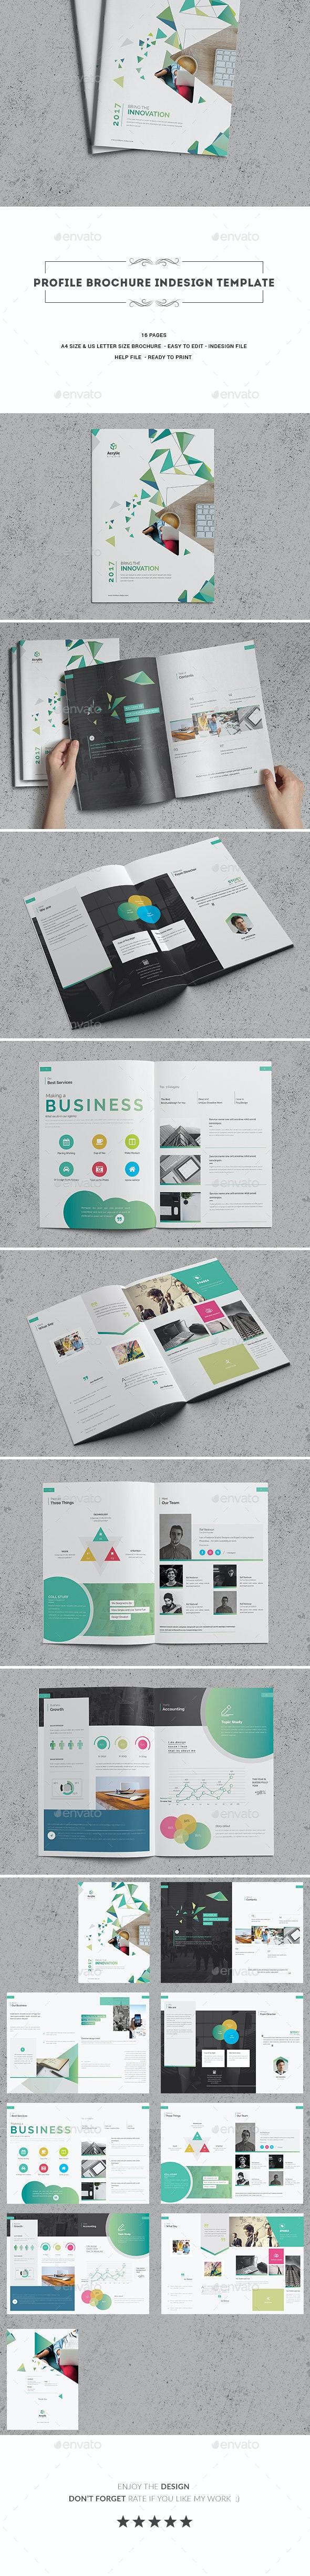 Profile Brochure Indesign Template - Corporate Brochures